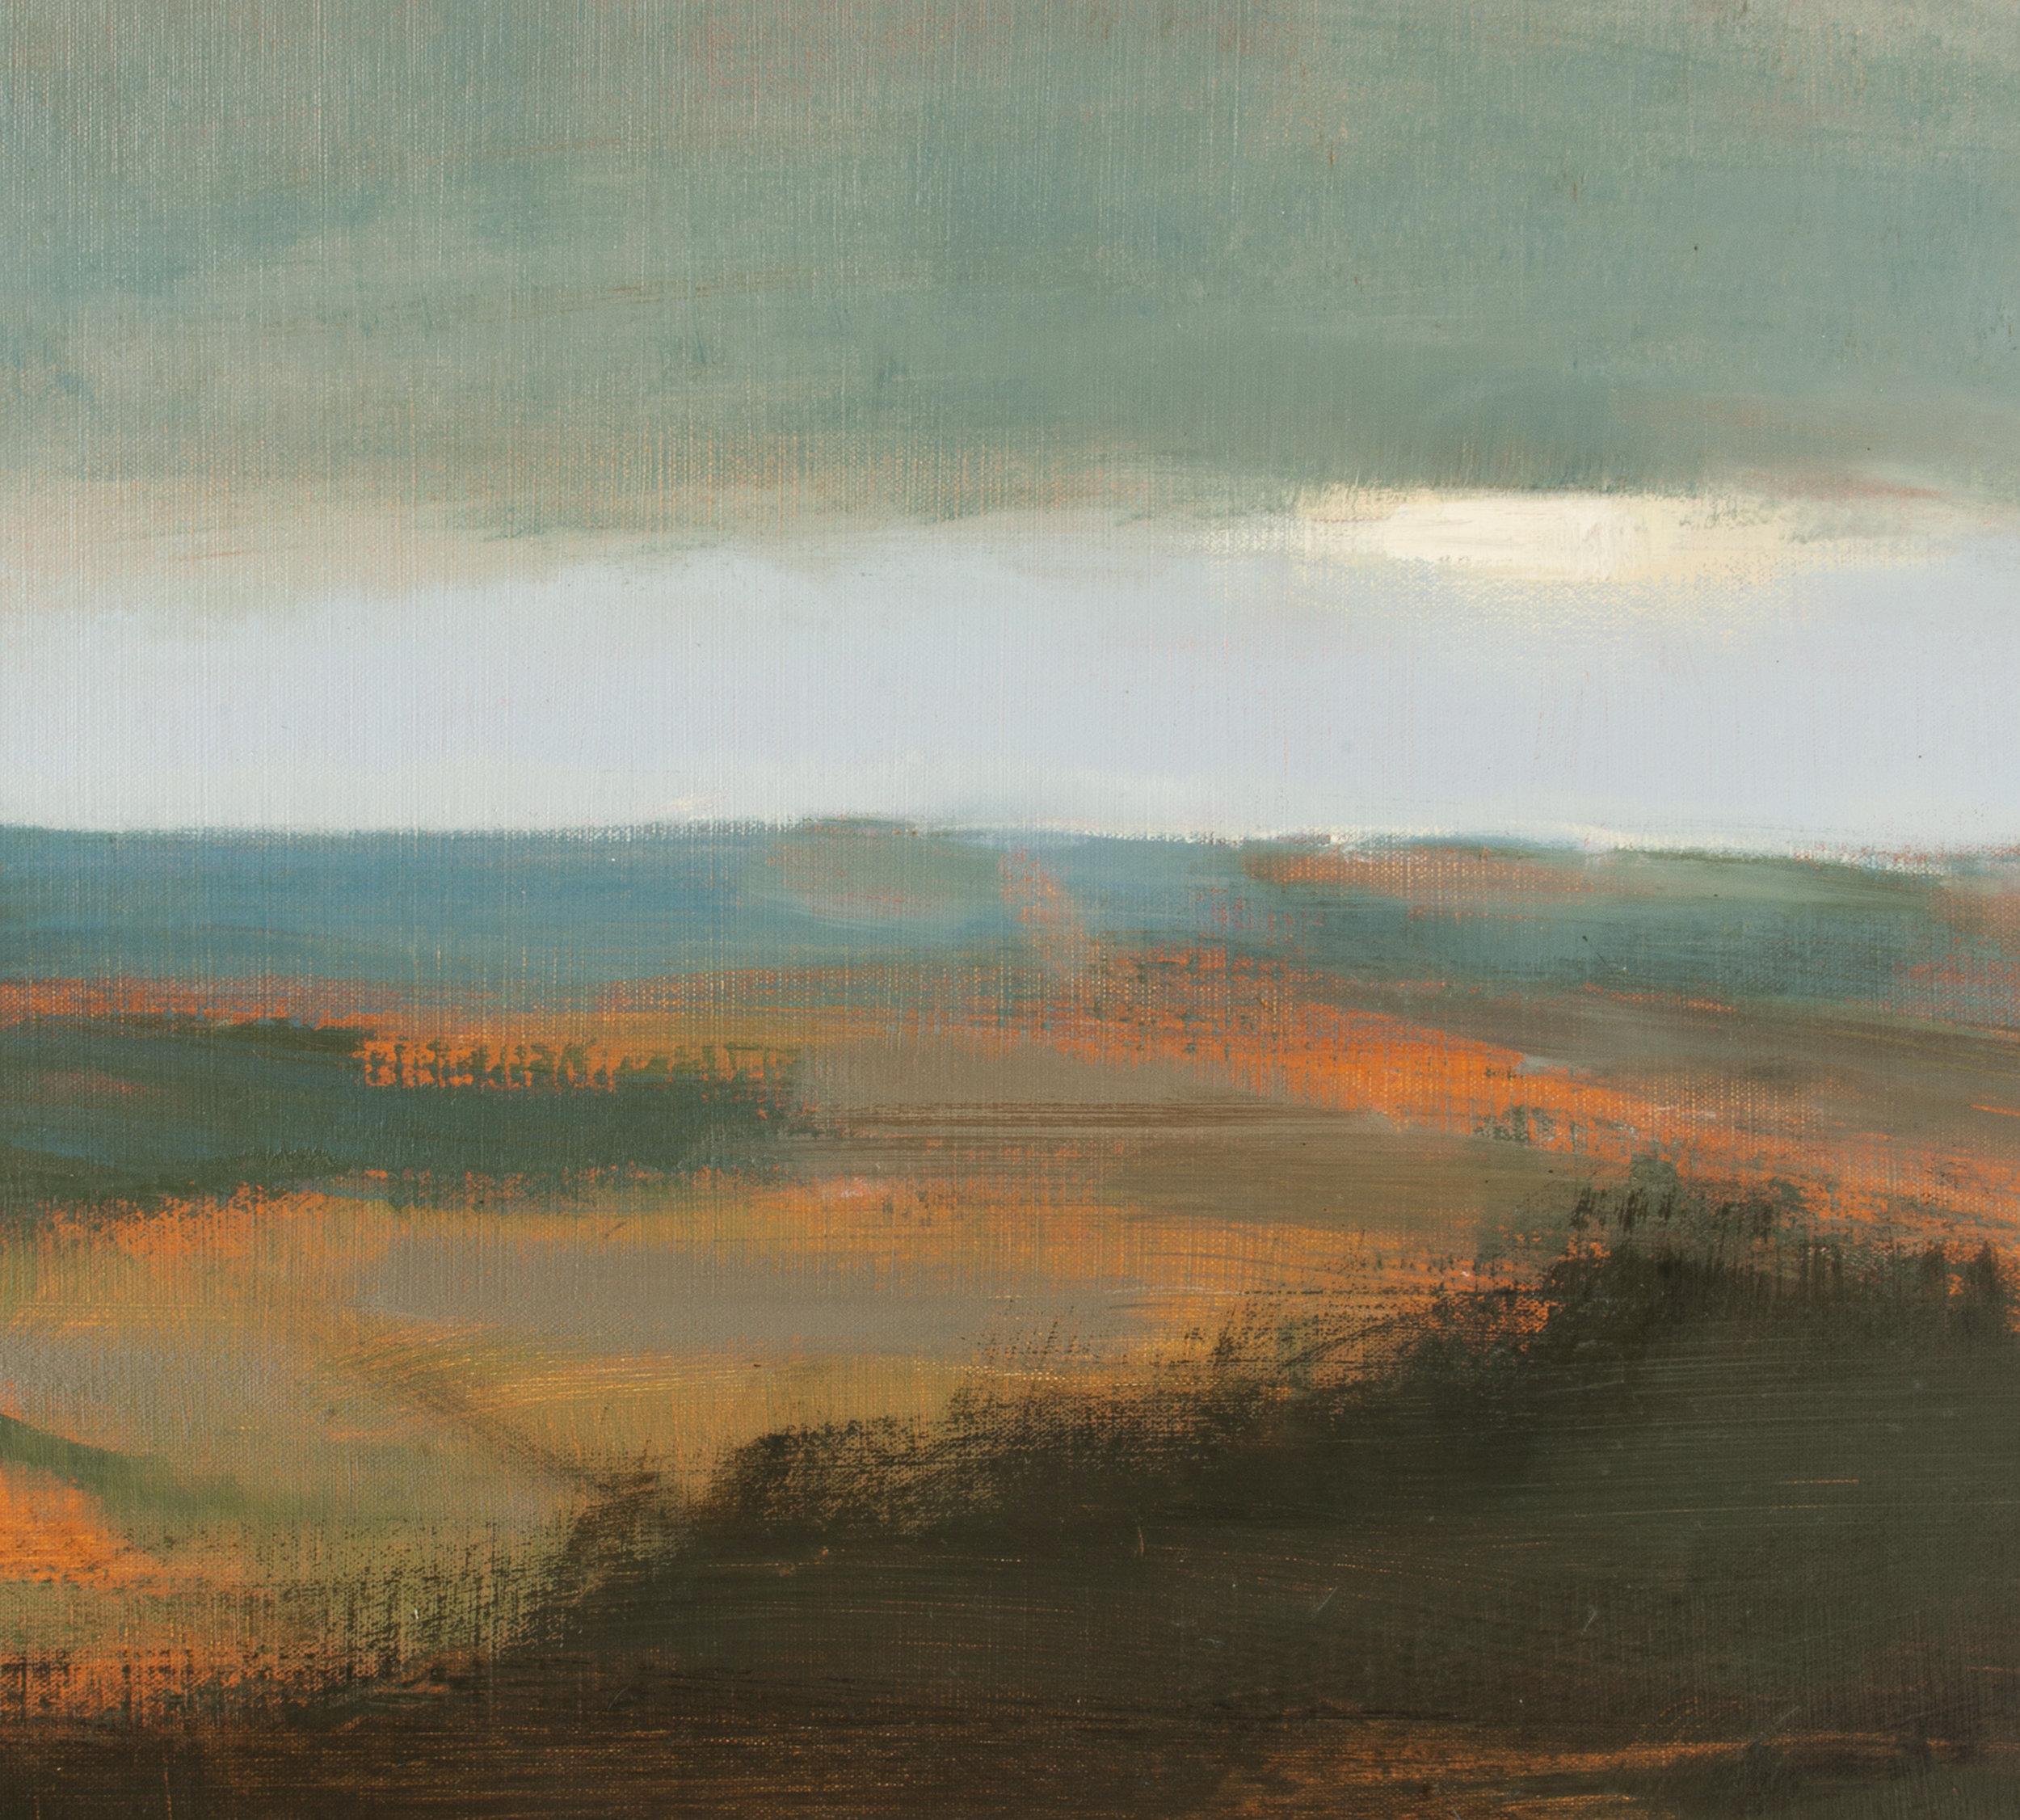 Artist: David Scott Moore  Title: Mill Hill Summer Landscape - 2019  Size: 66 x 61 cm  Medium: Oil on canvas  Price: £1400